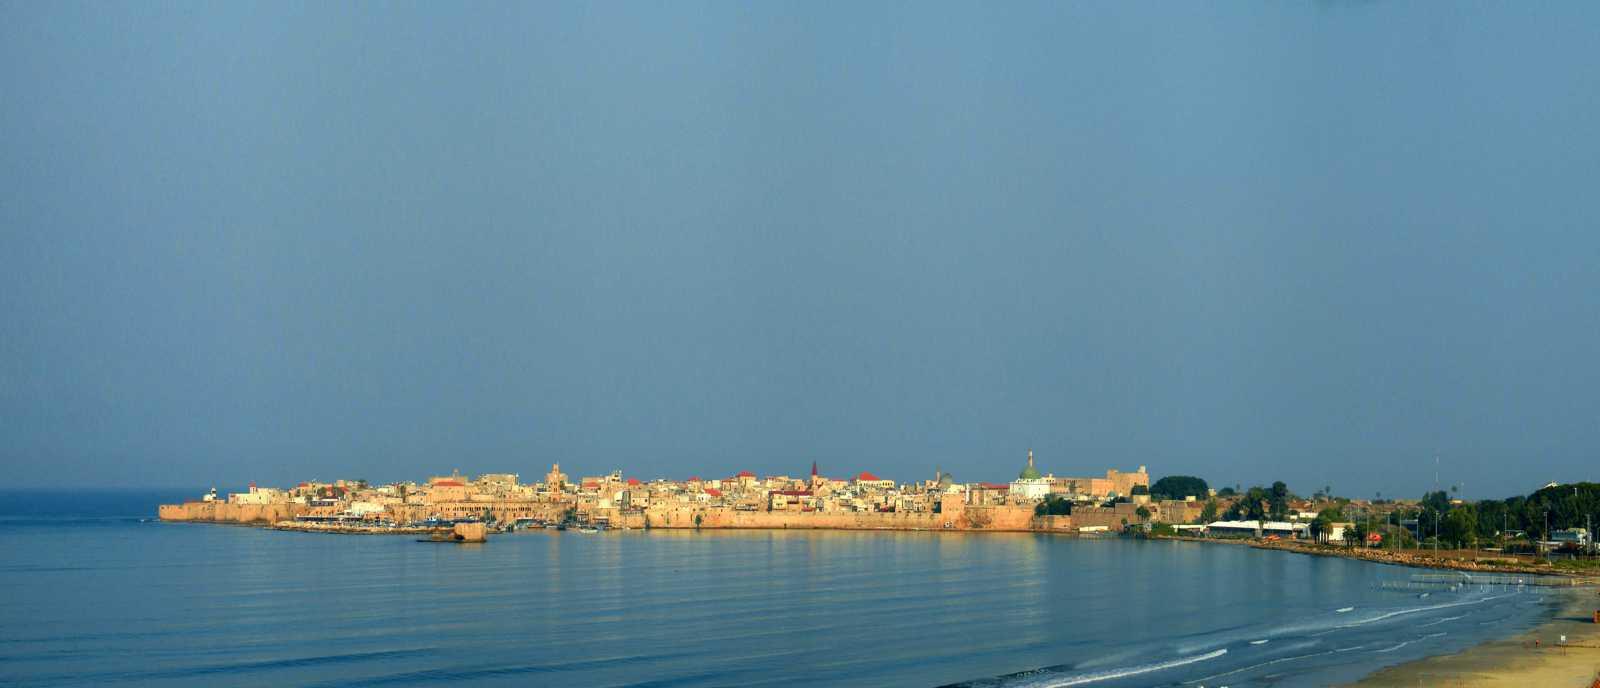 Панорама старого Акко с Хоф-hа-Тмарим (фото М.М.)